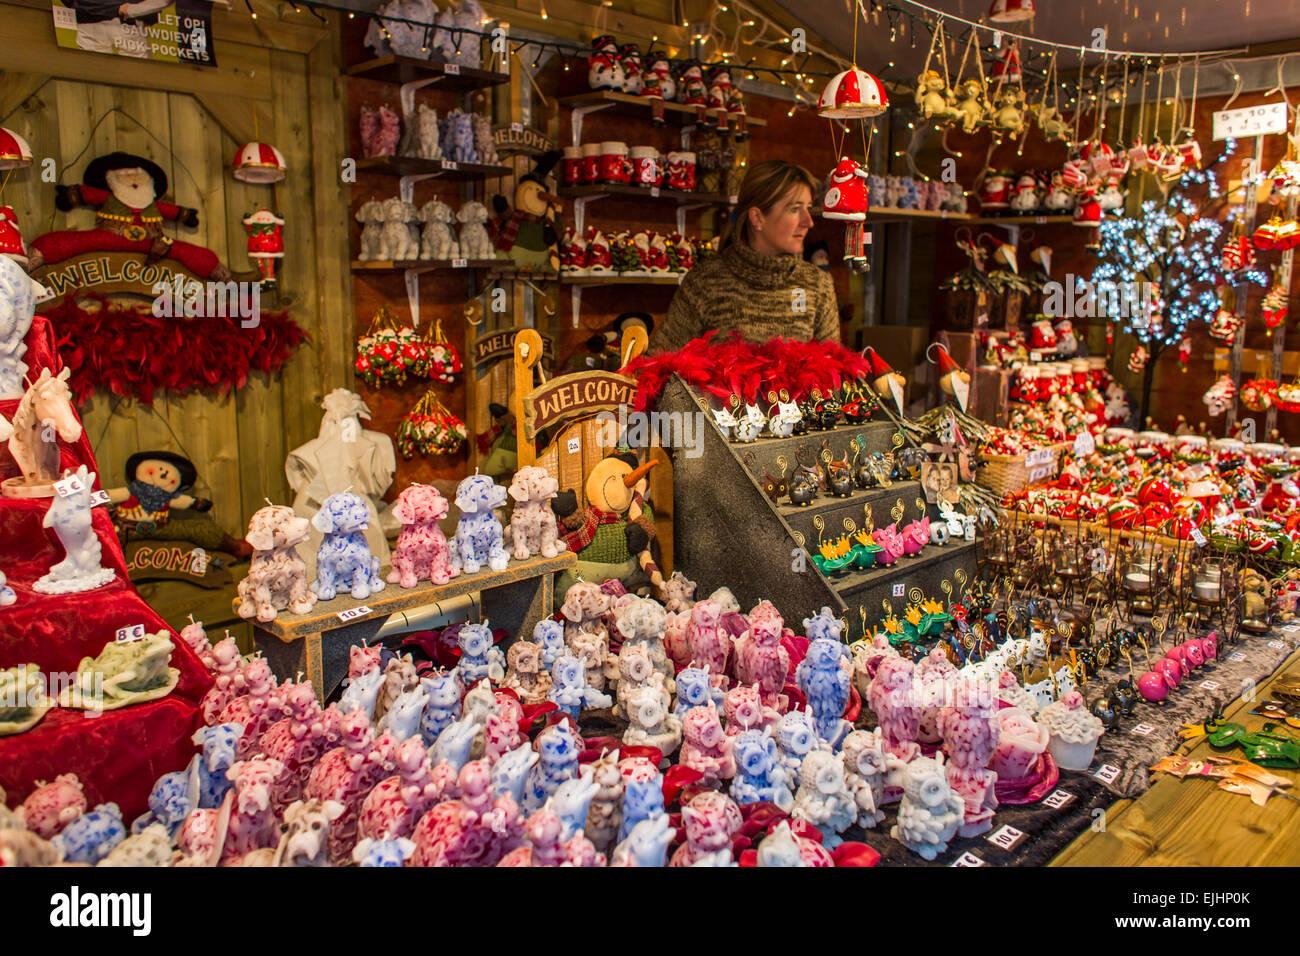 Bruges Christmas Market Images.Christmas Market In Main Square In Bruges Belgium Stock